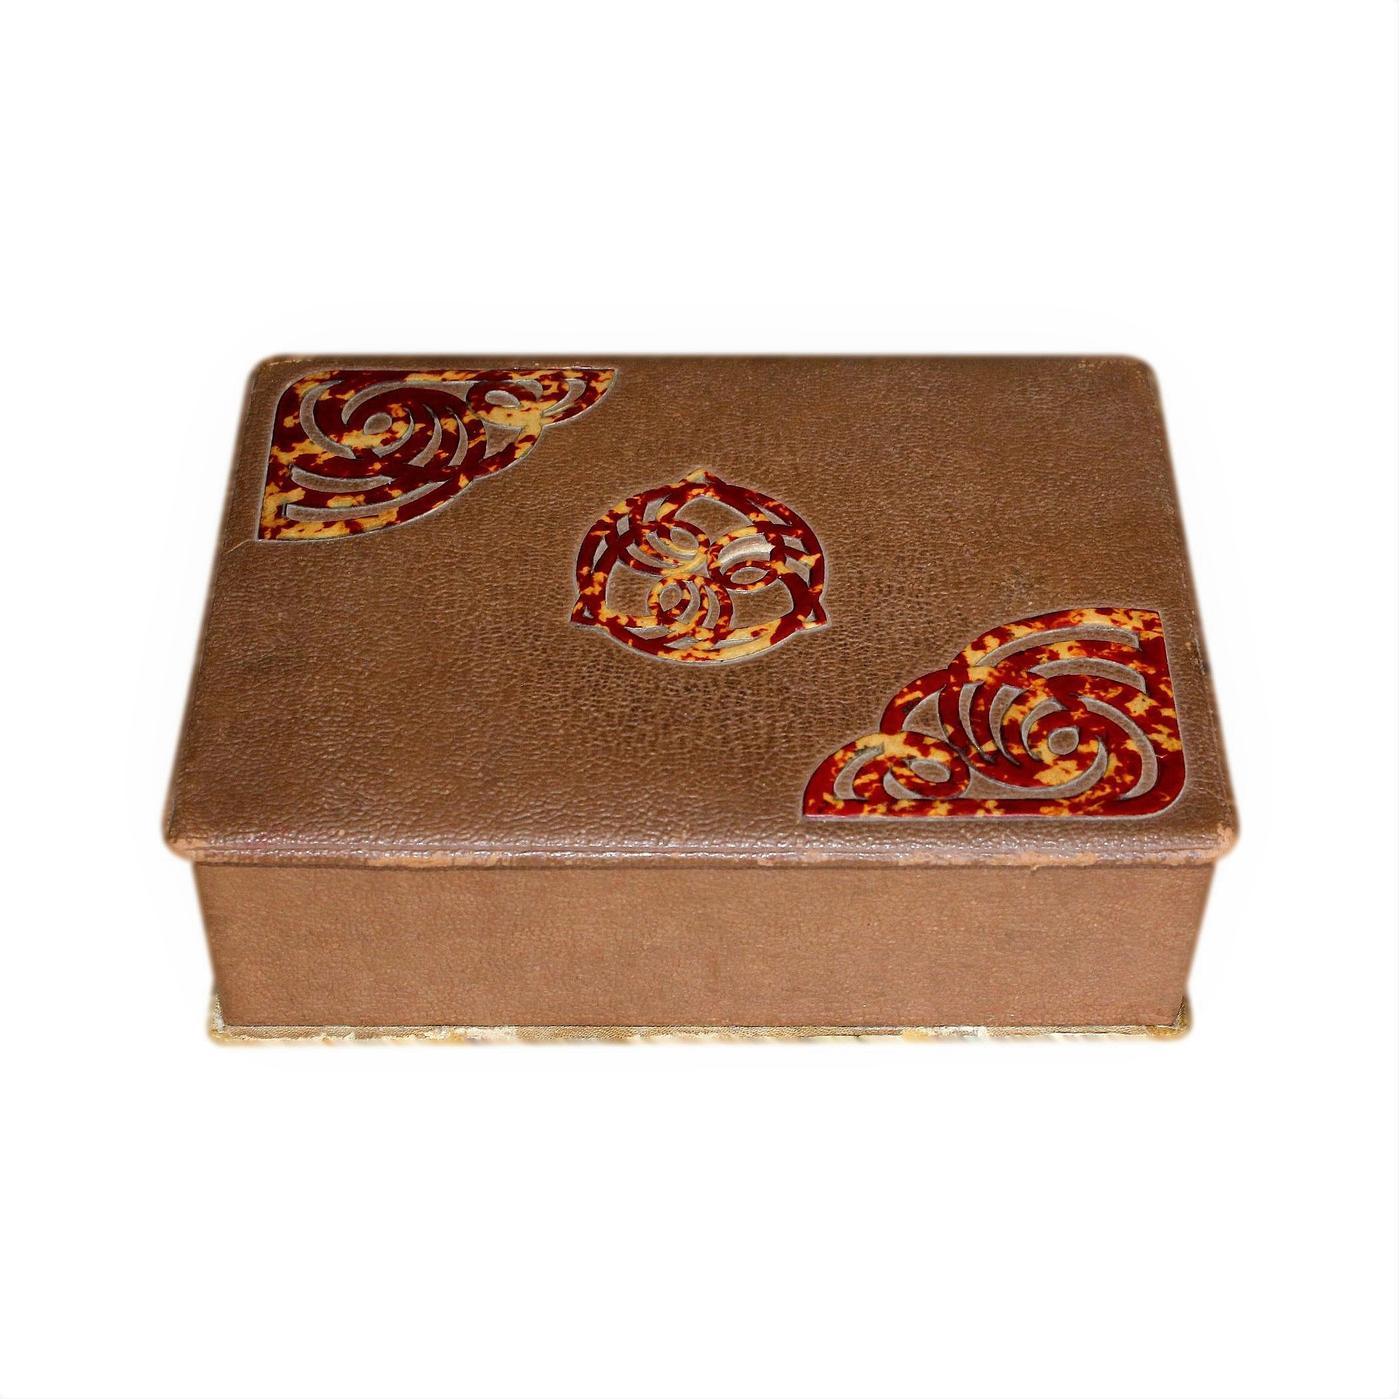 Antique Art Nouveau Arts And Crafts Jewellery Box